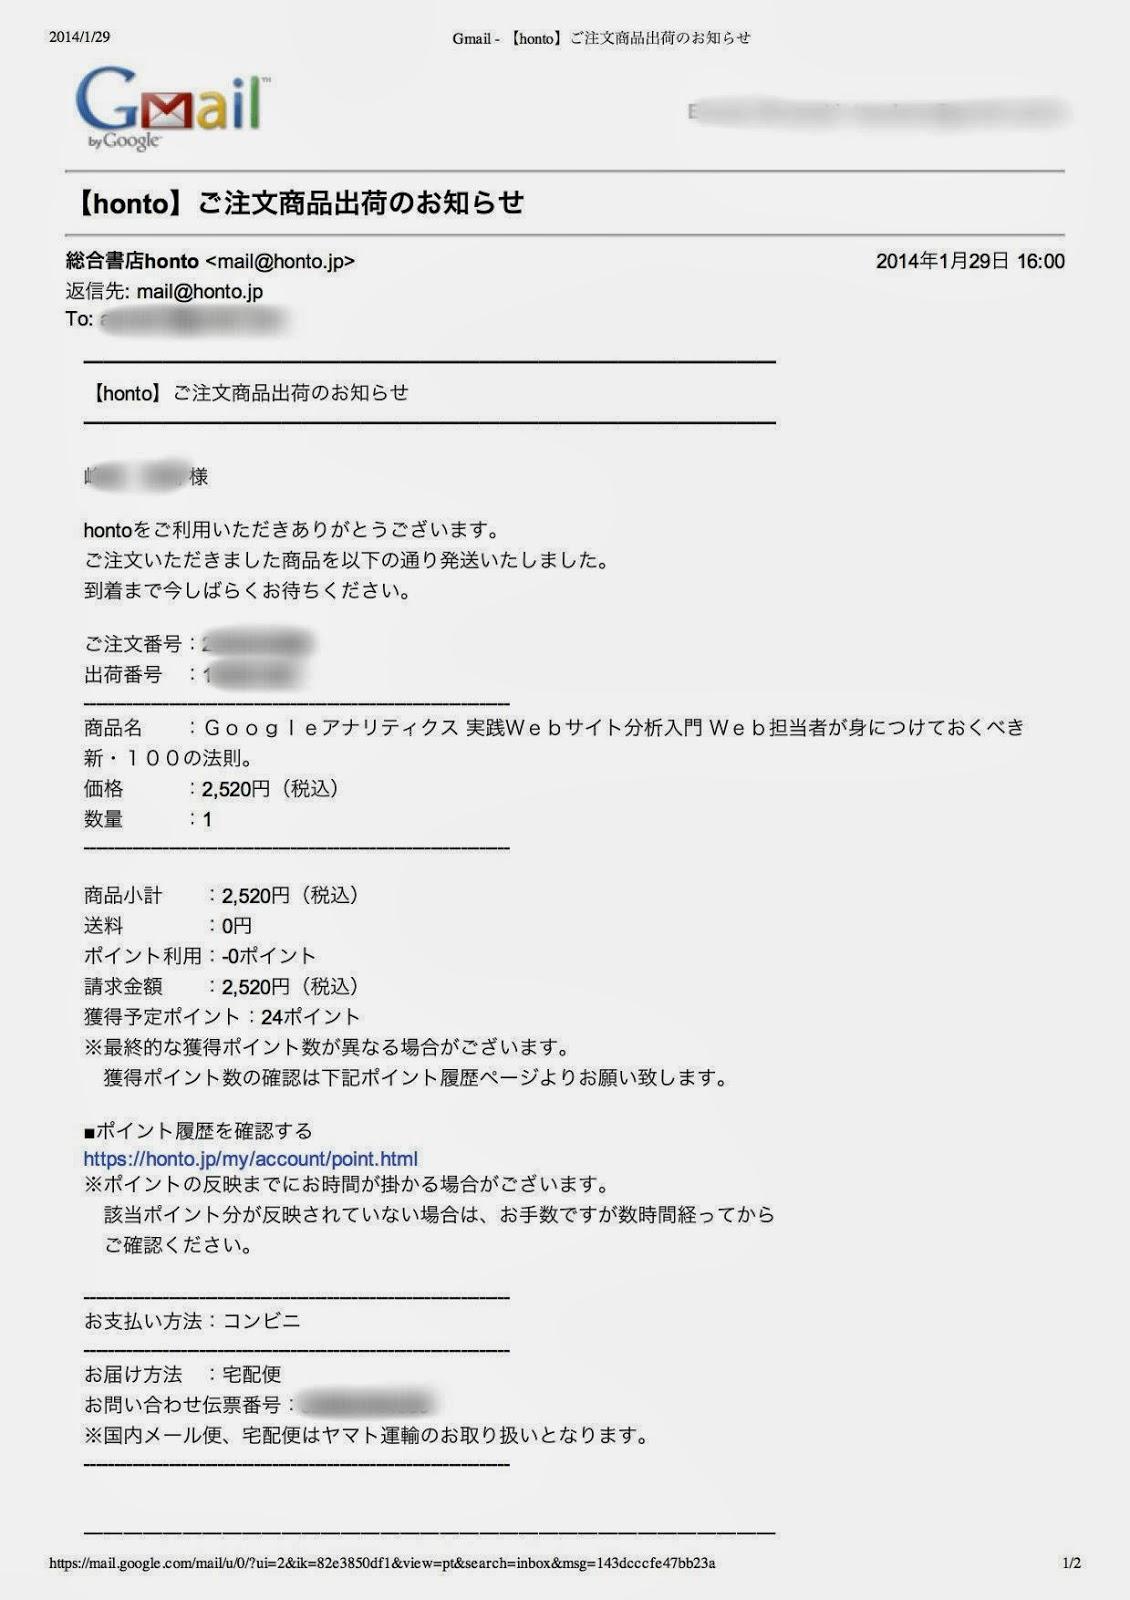 honto発送通知メール